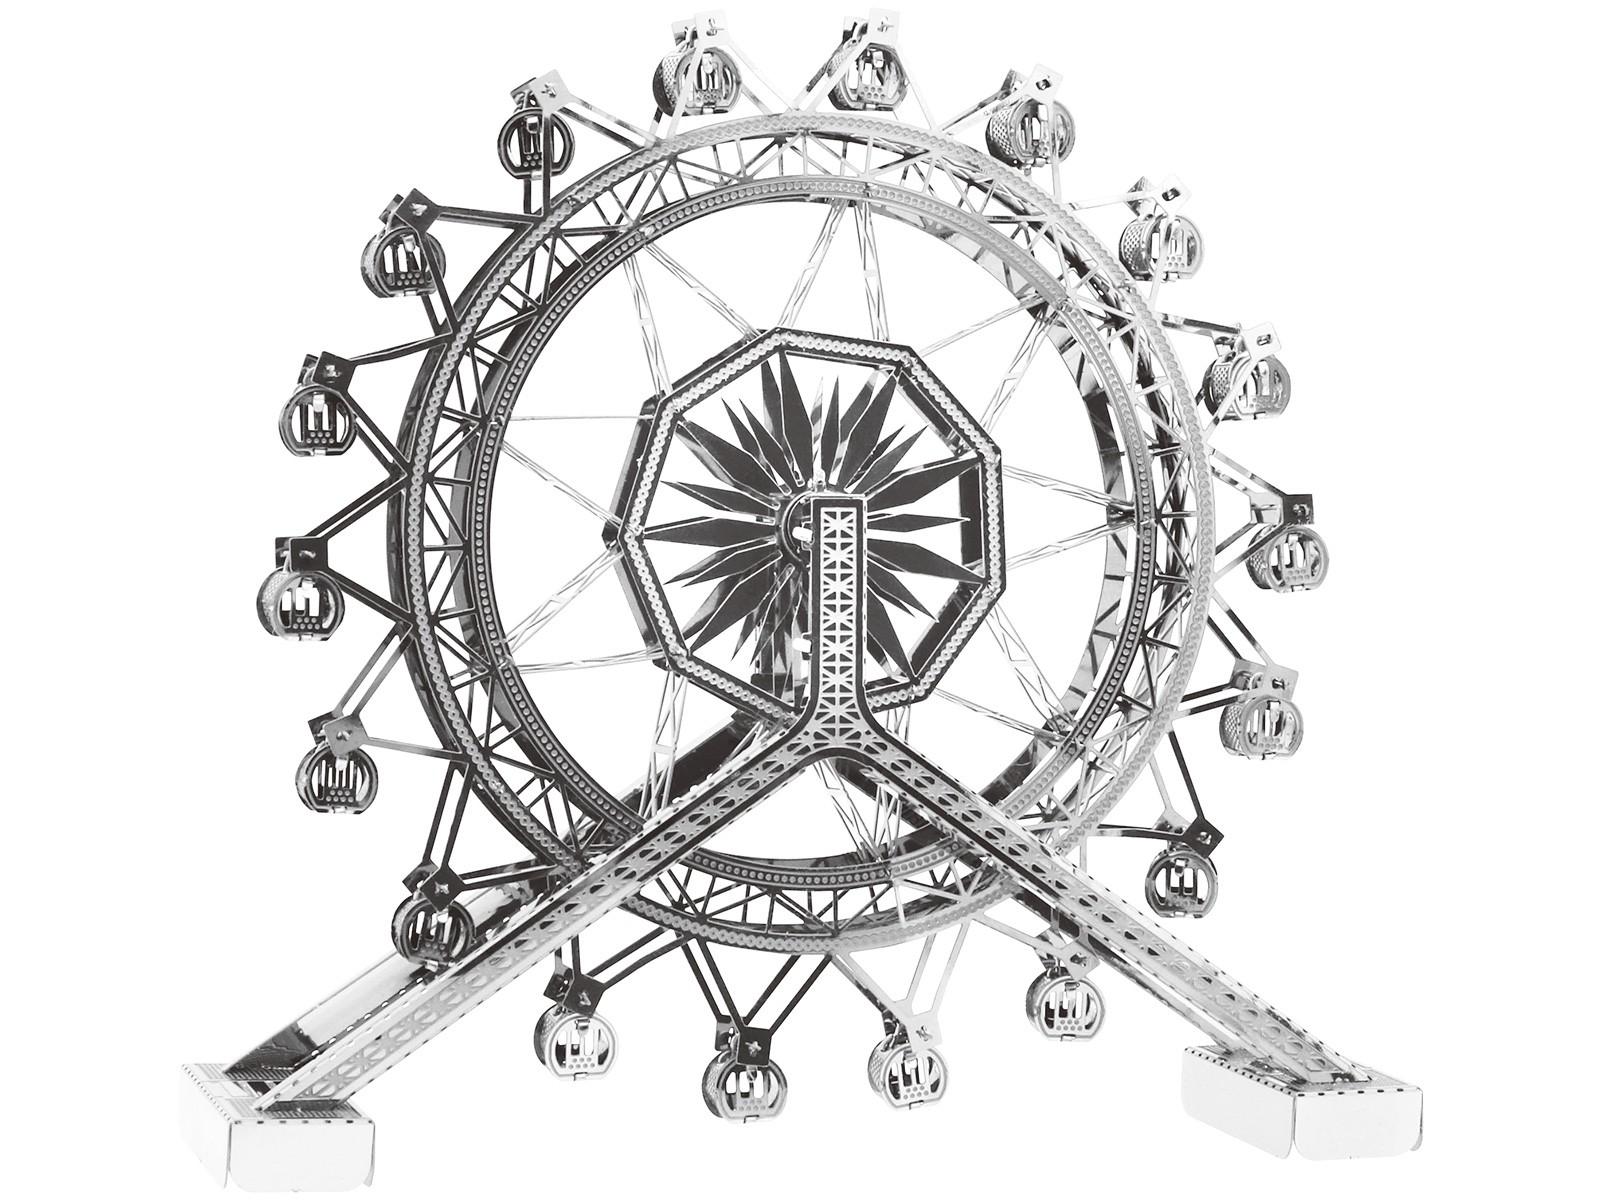 Mini-Metallbausatz Riesenrad